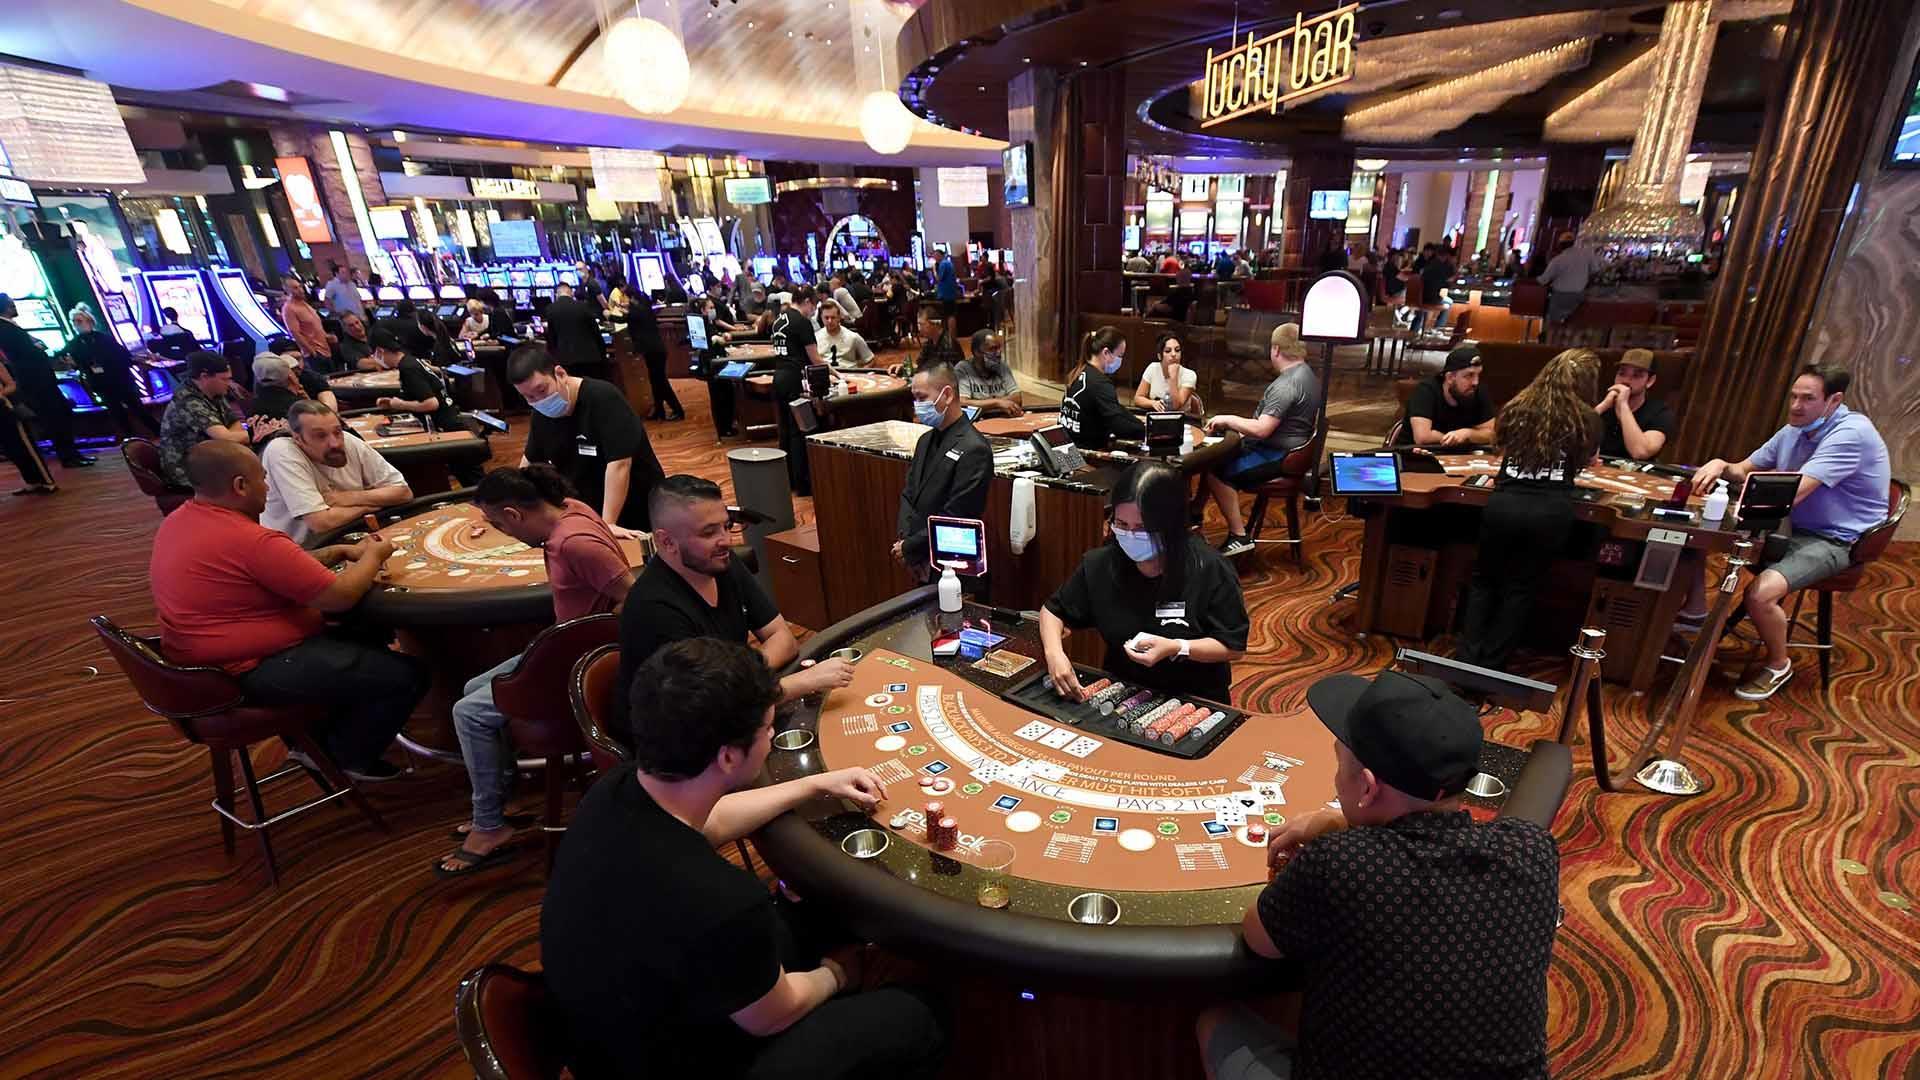 Revelers return to Las Vegas casinos after coronavirus closure ends